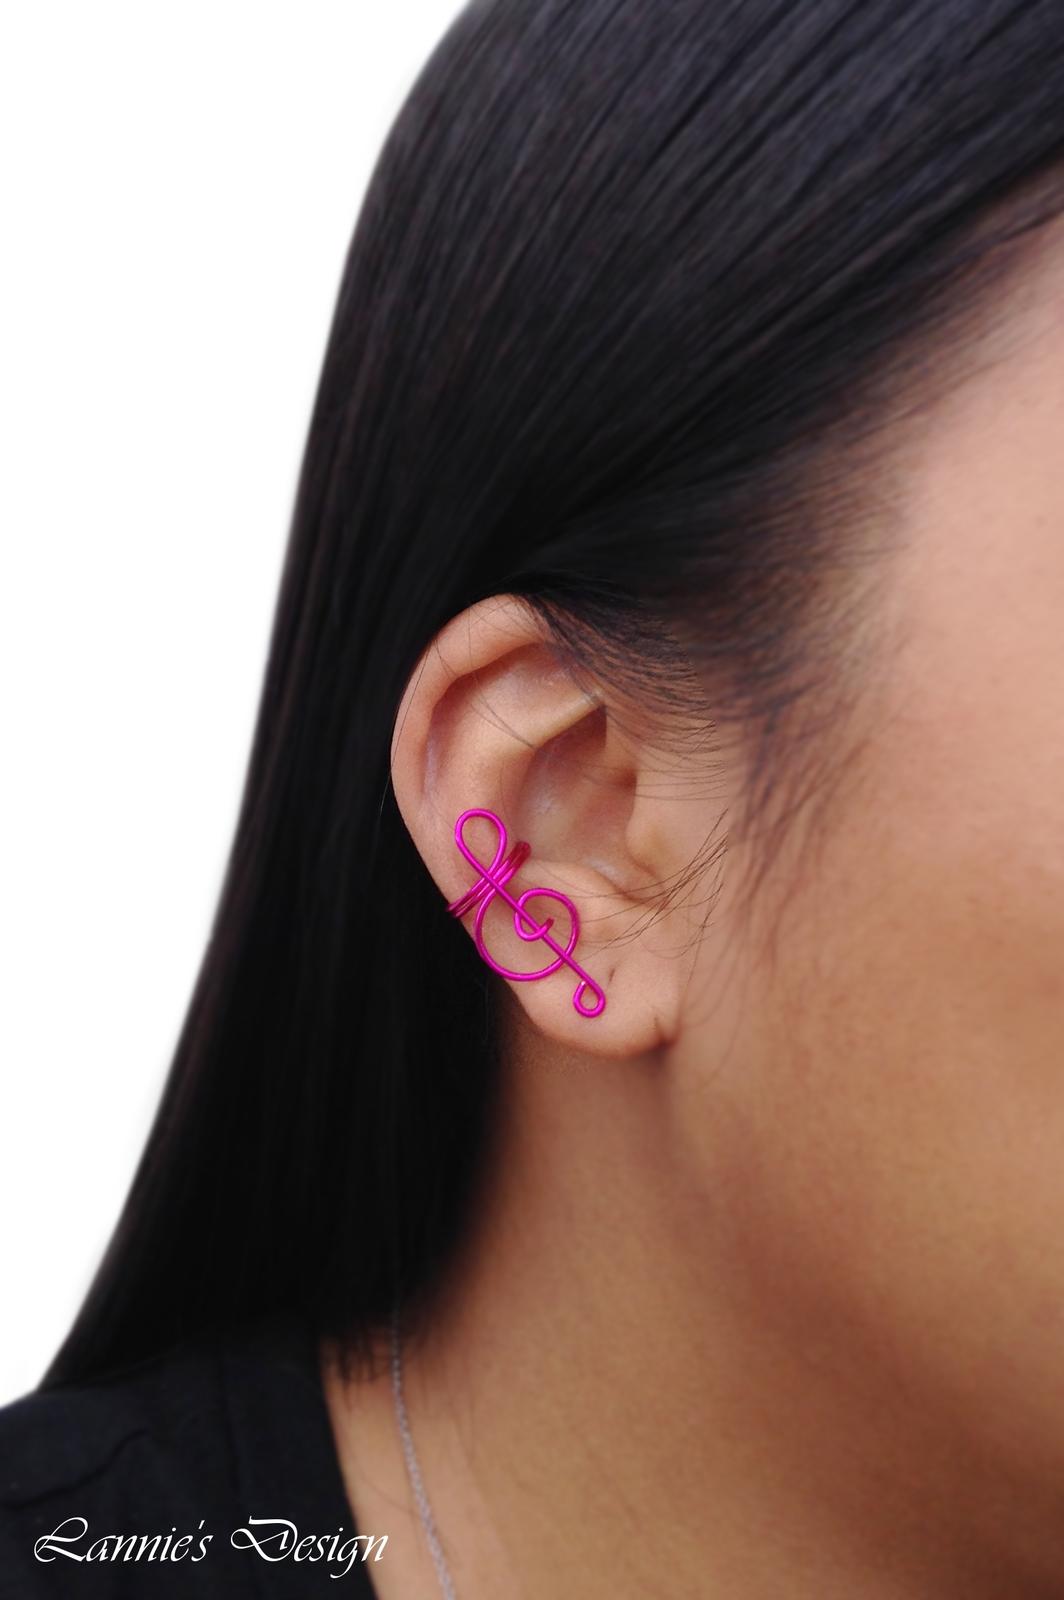 Hot Pink Treble Clef Ear Cuff, No Piercing Cartilage Earrings